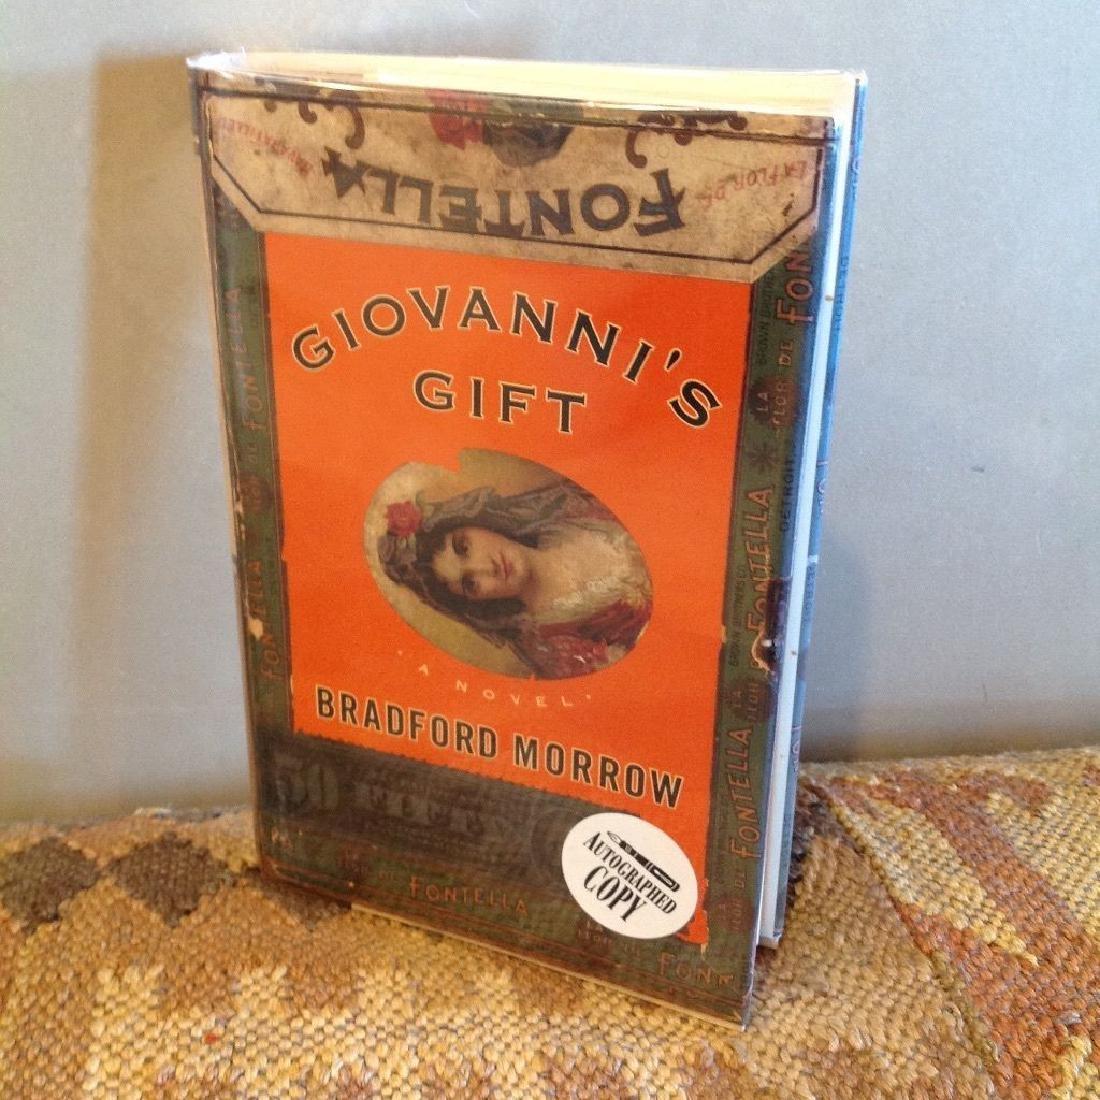 Bradford Morrow: Giovanni's Gift, 1997 - Signed